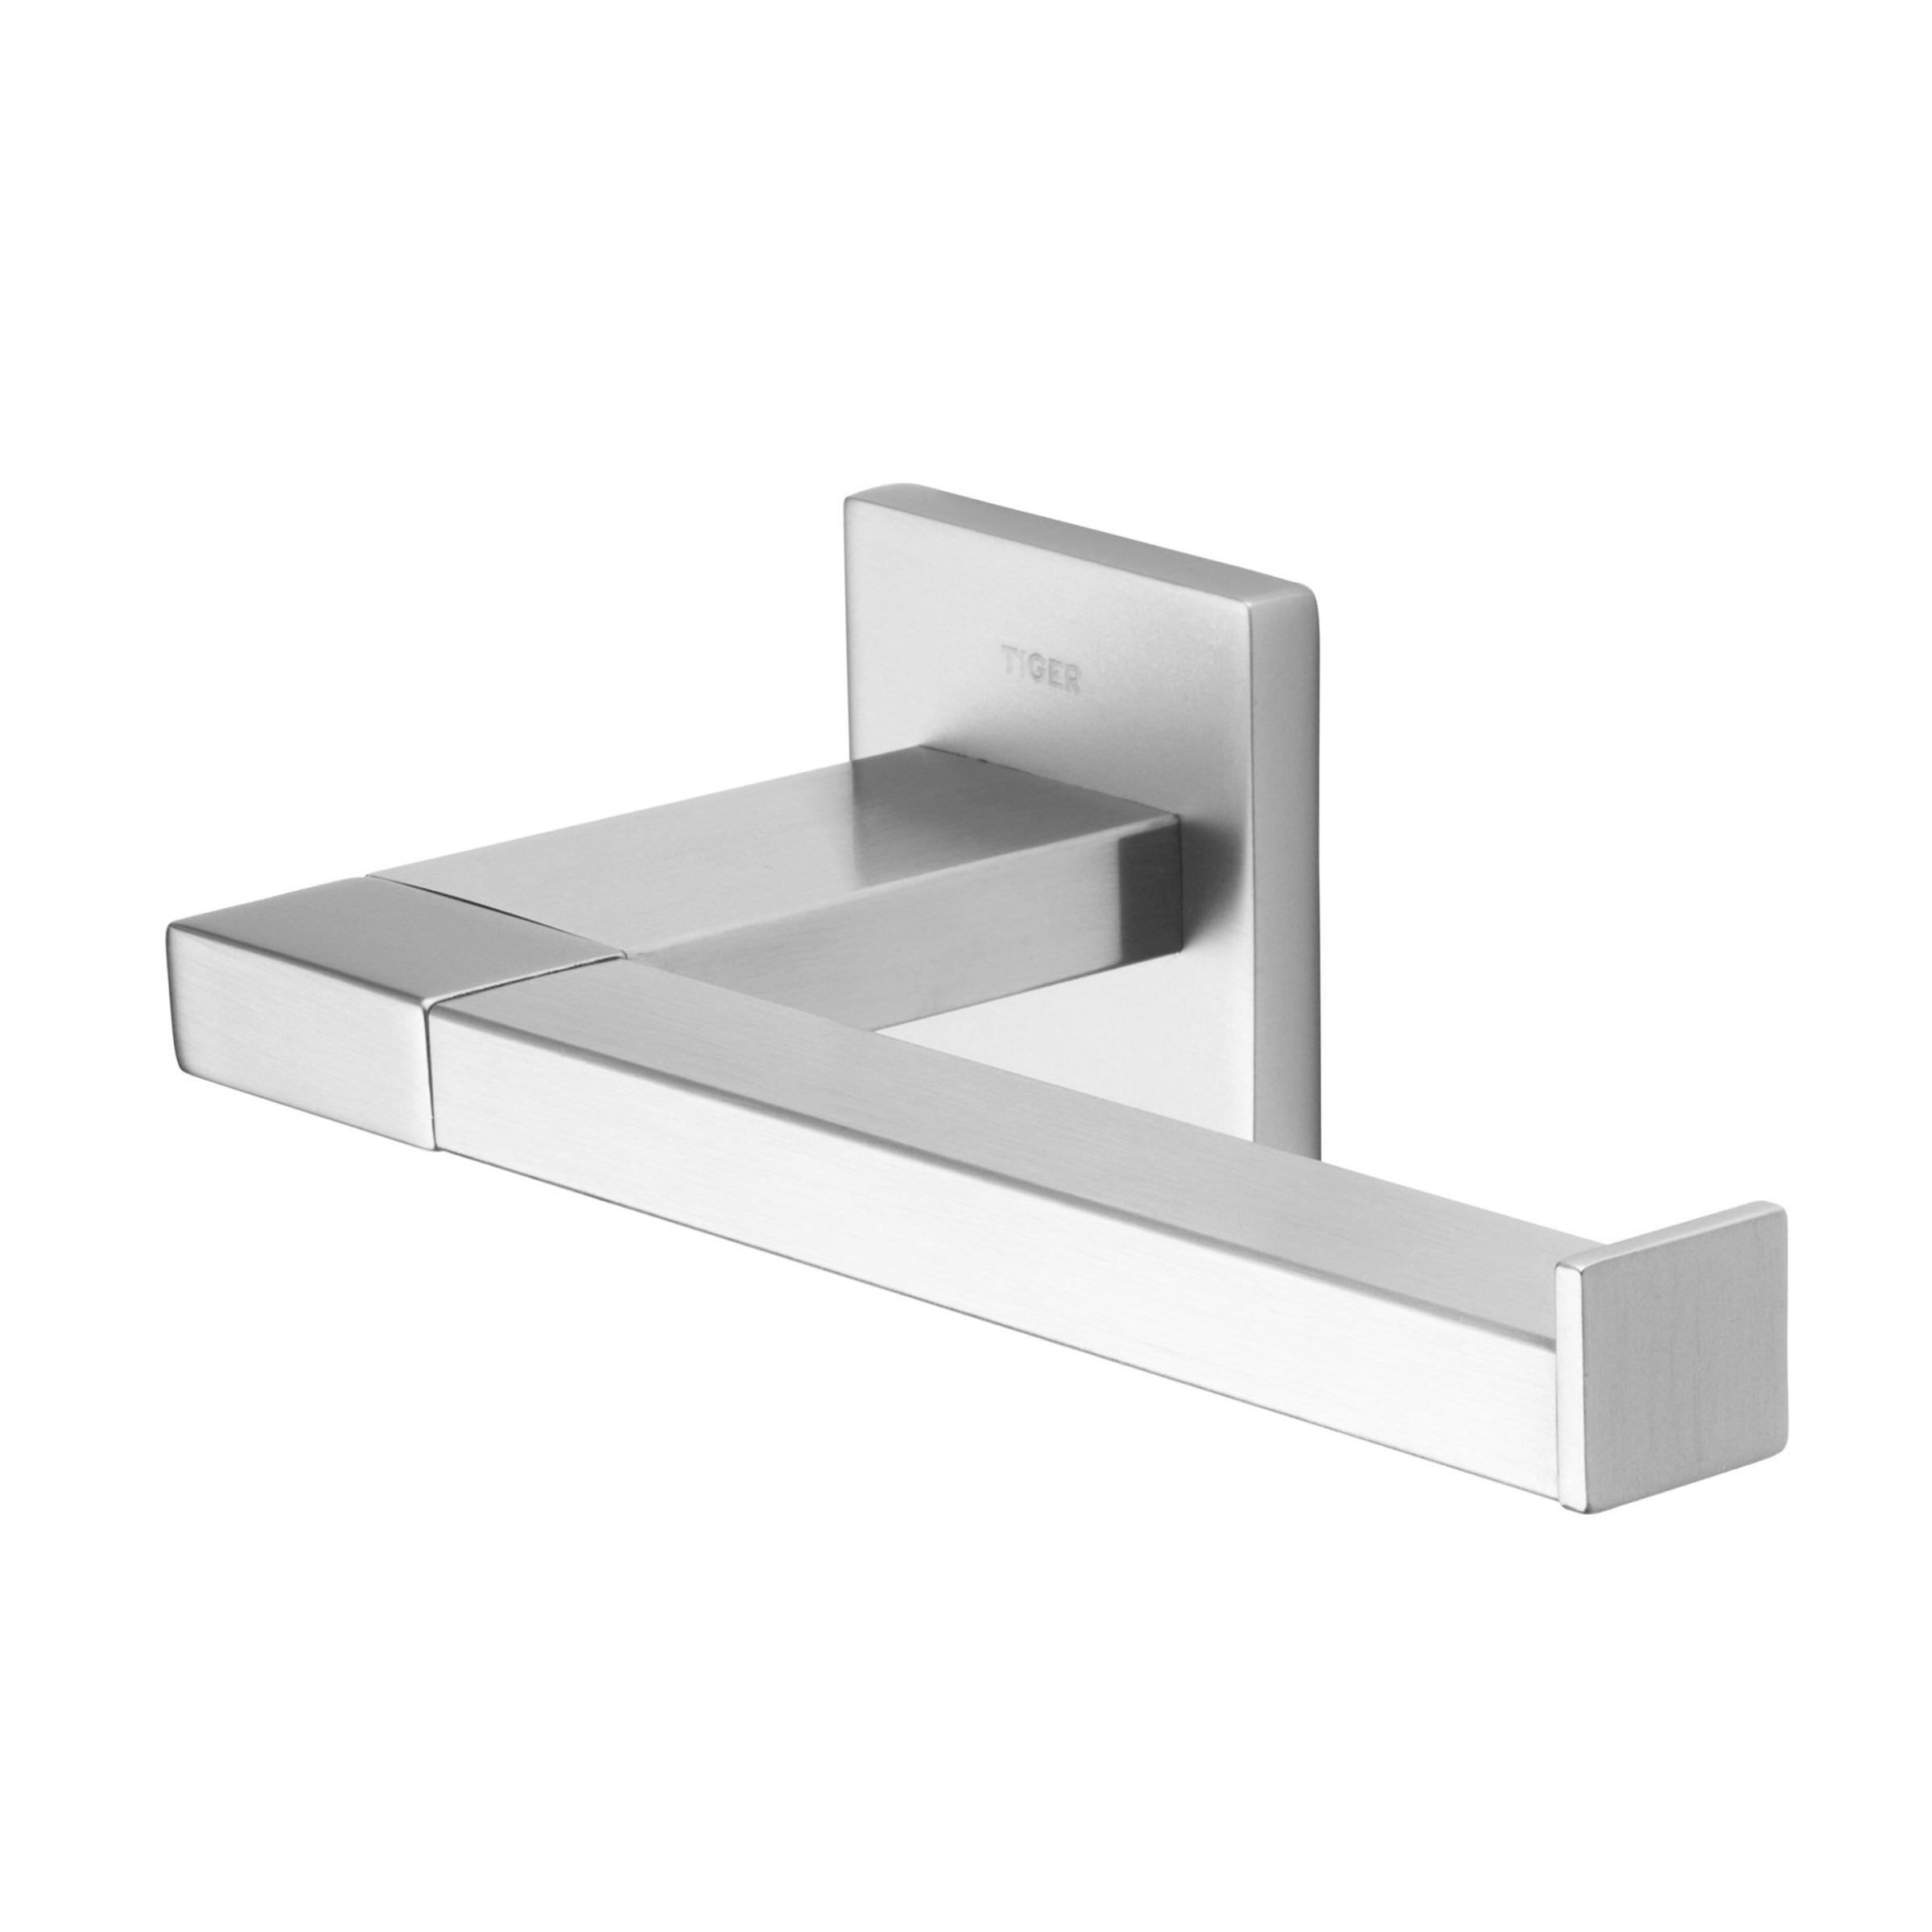 porte papier wc items tiger inox accessoires wc toilettes sanitaire chauffage. Black Bedroom Furniture Sets. Home Design Ideas